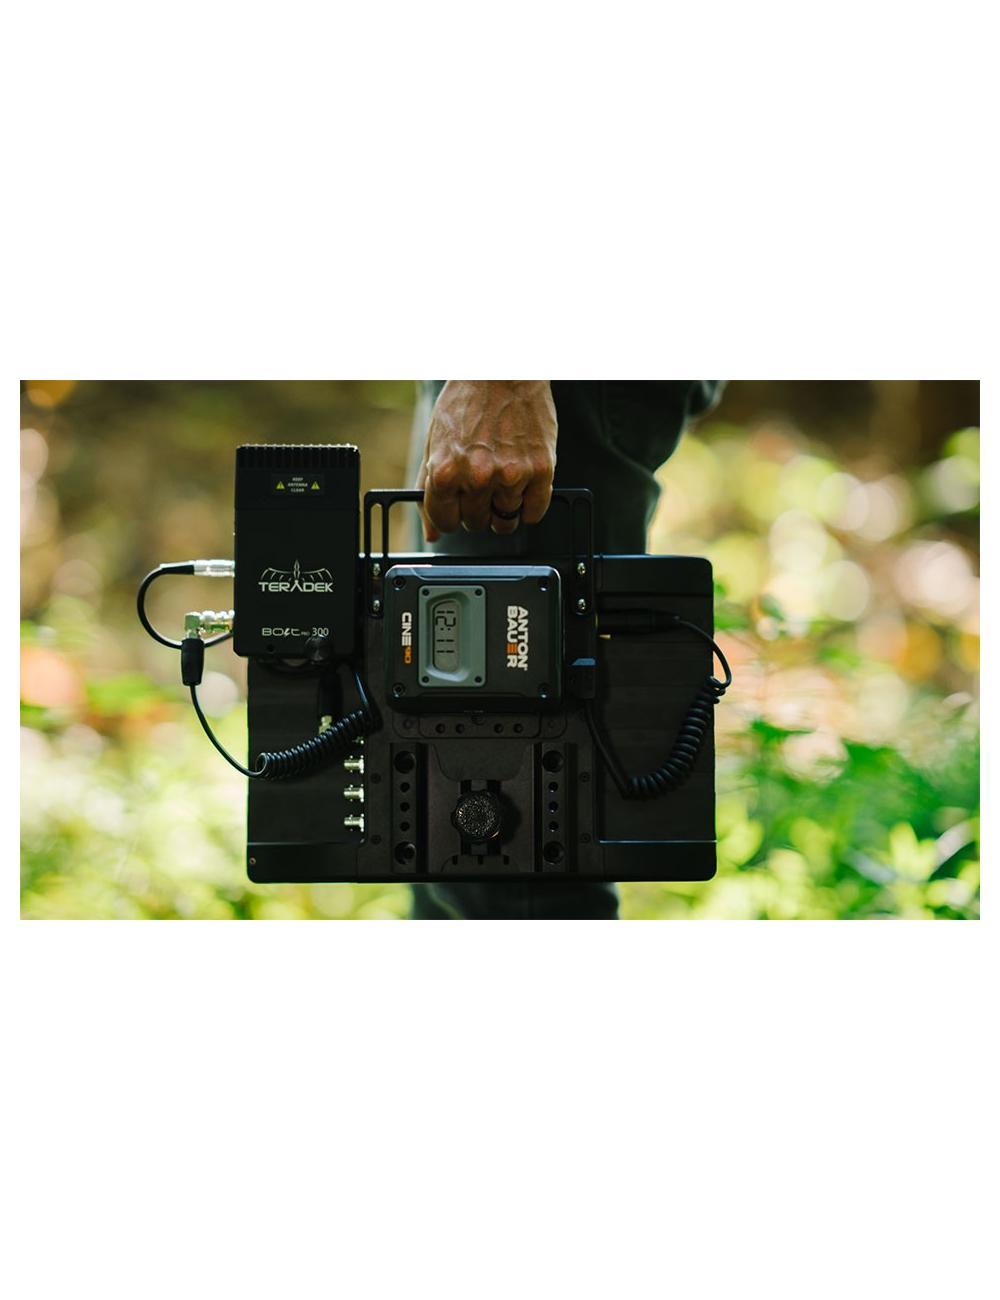 Small HD 1303 HDR Production Monitor